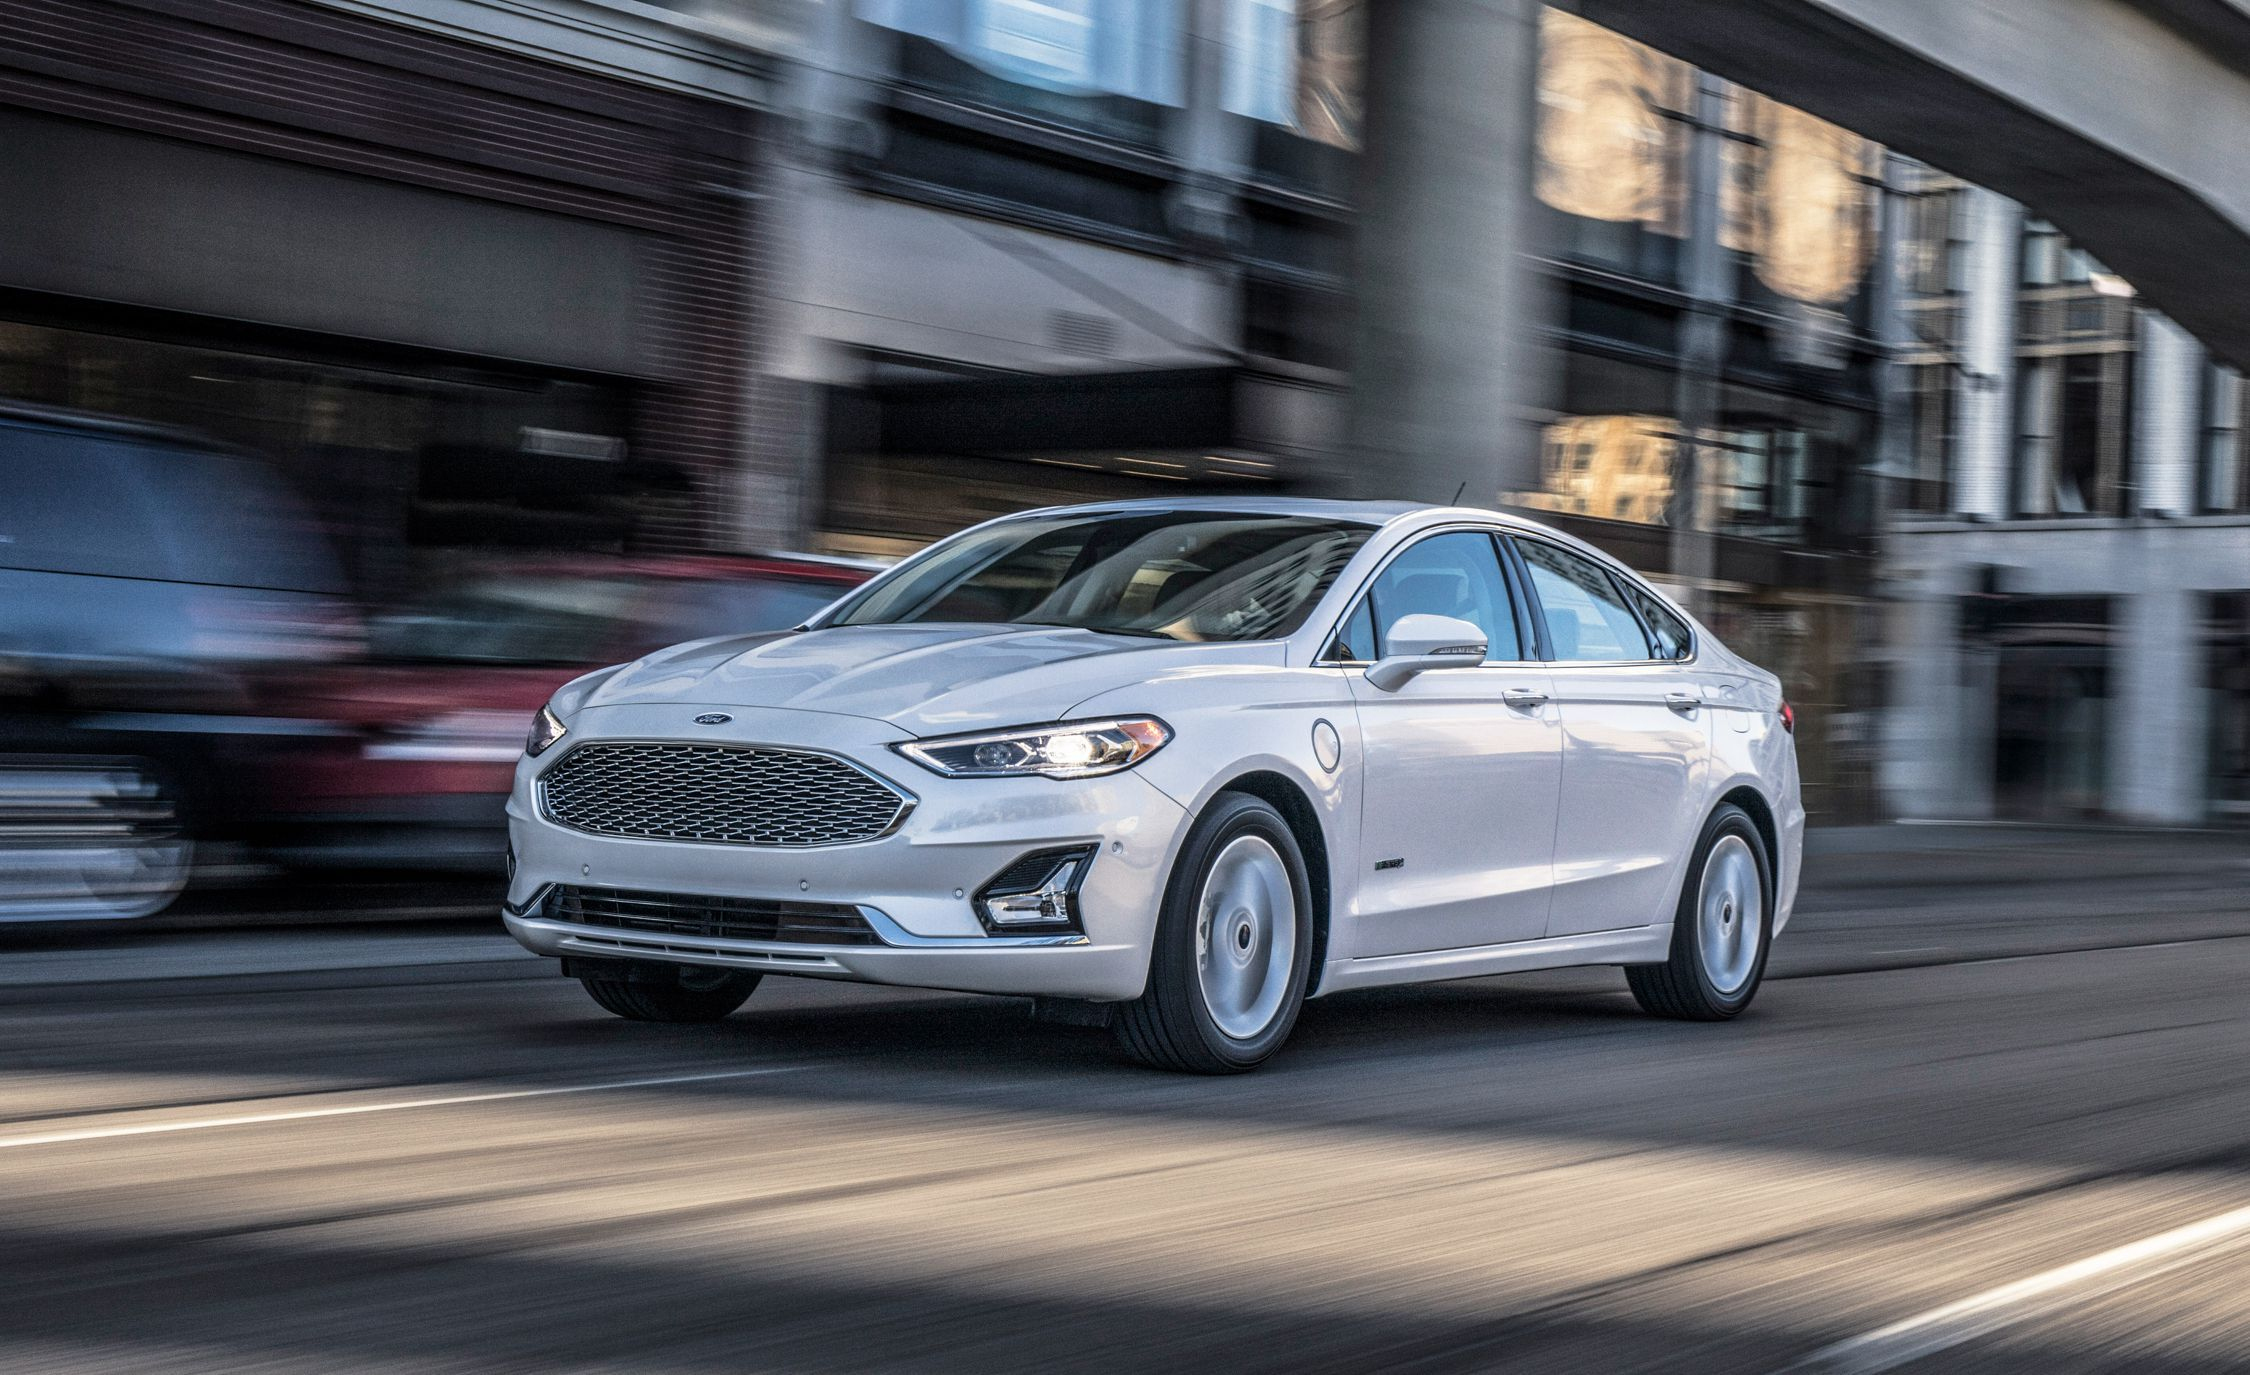 2021 Ford Fusion Platinum Price, Automatic Feature, Specs